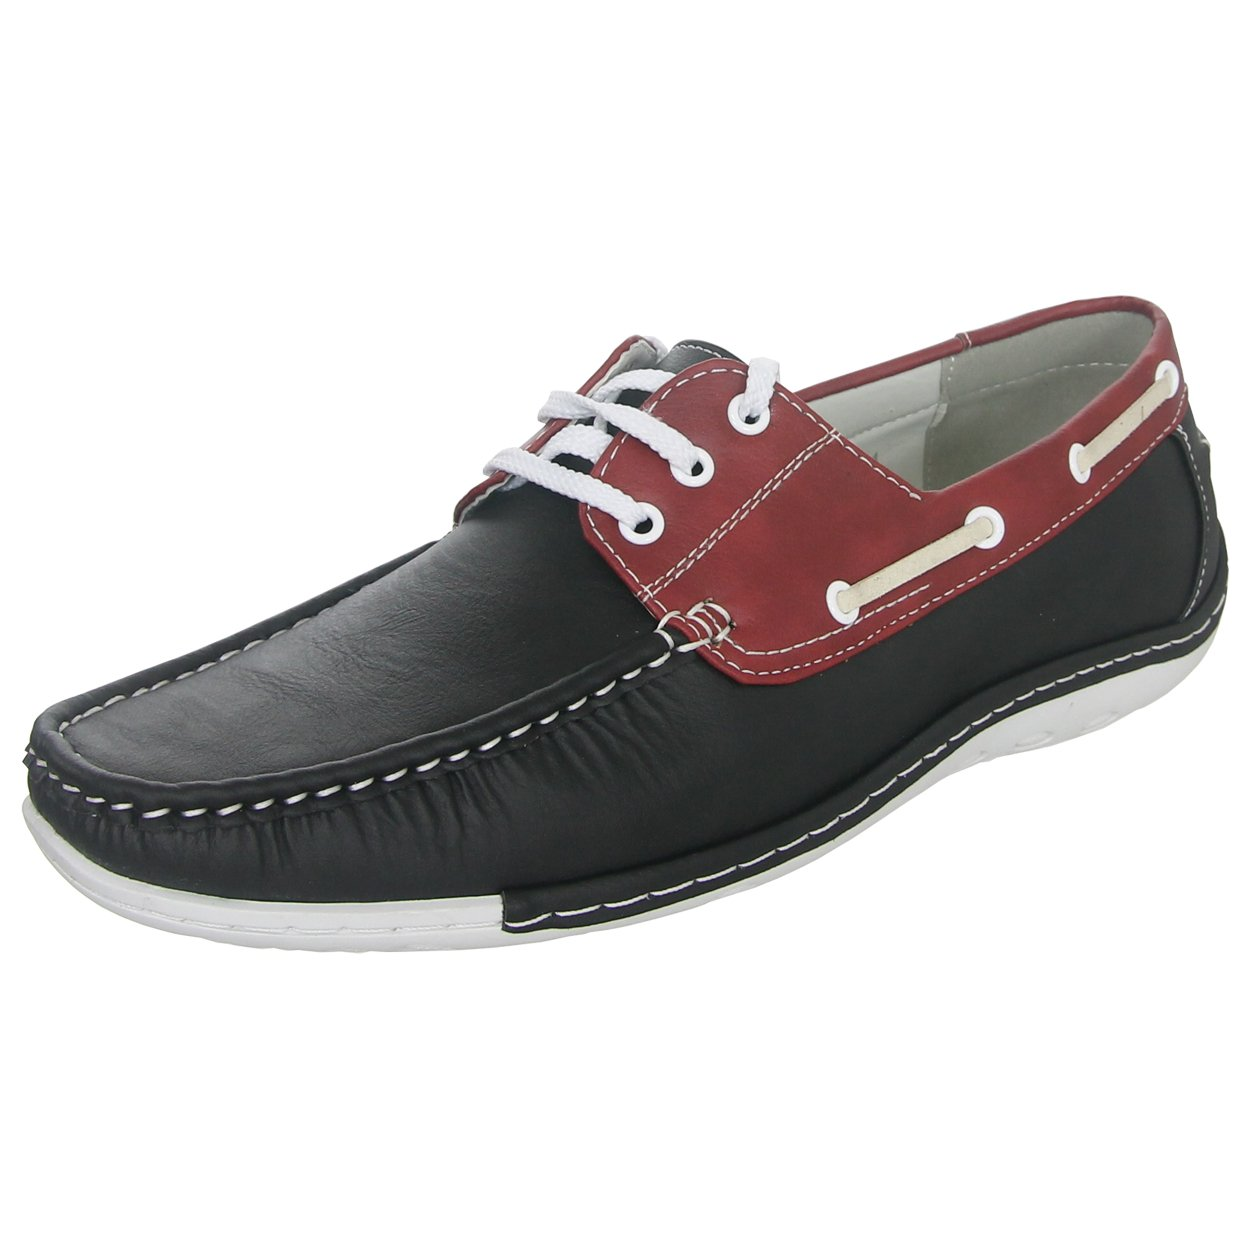 Zoyla Italia Men's Boat Shoe B0757X8RR1 11 D(M) US|Black/Red